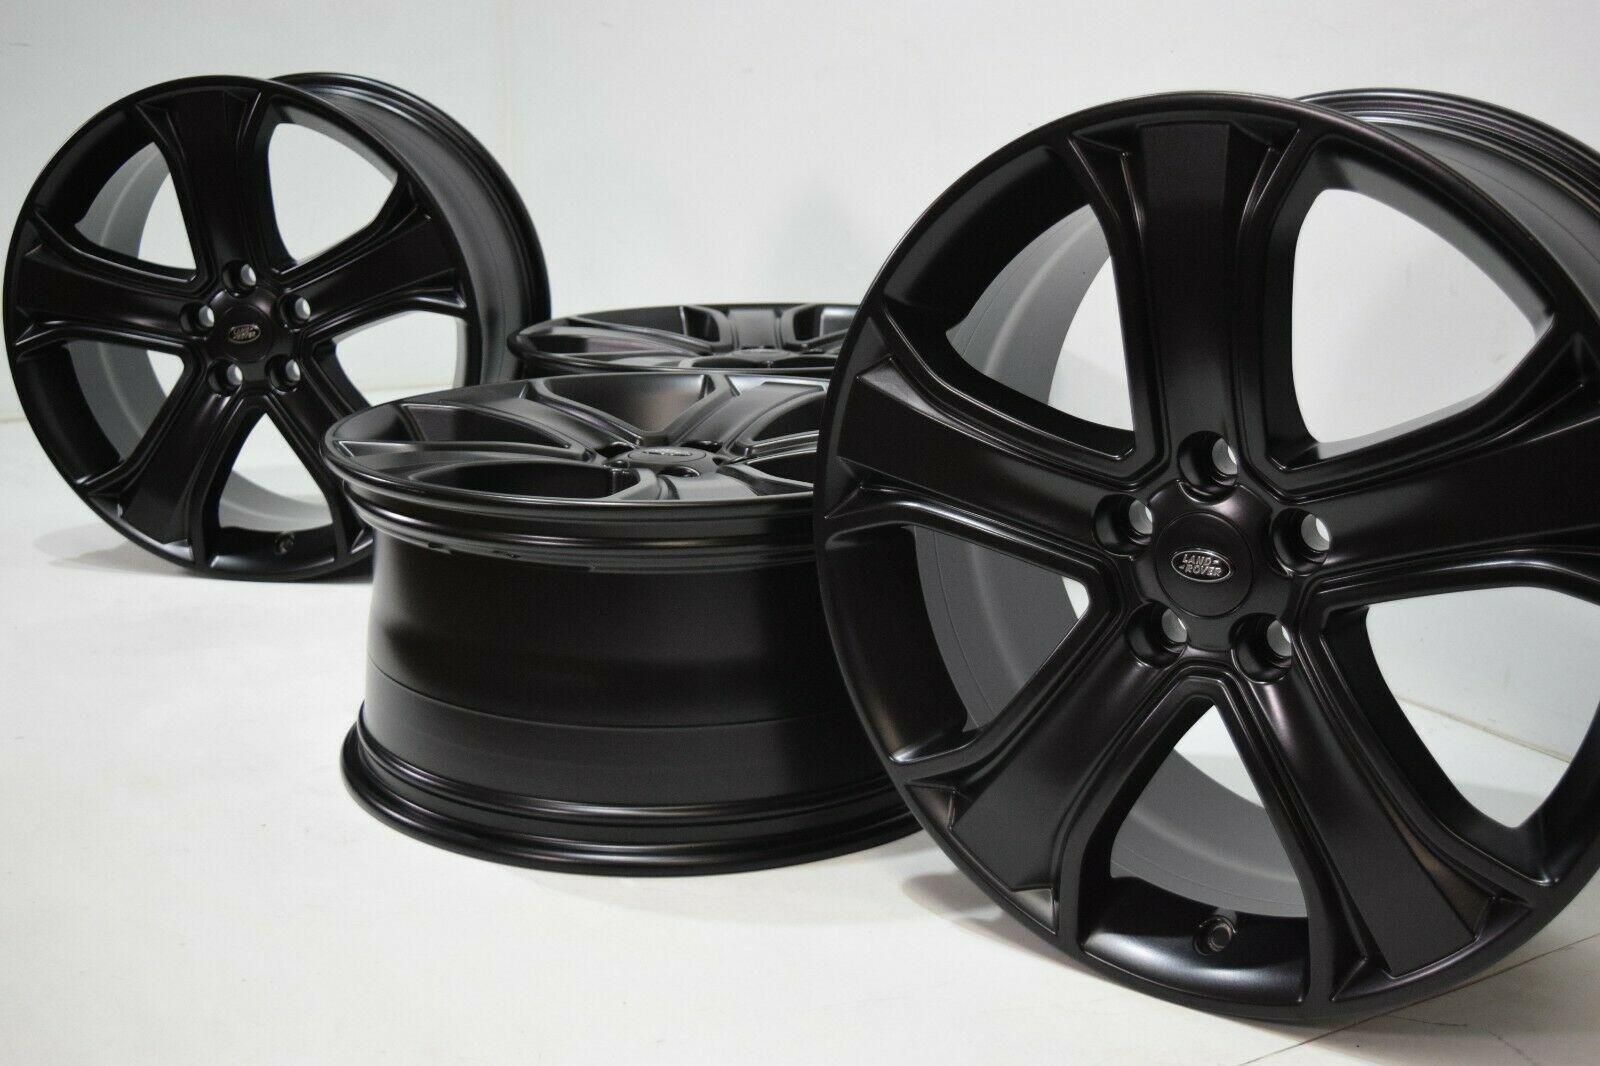 20″ Range Rover Sport 2006-2013 LR4 Factory OEM 20″ Wheels Rims Satin Black